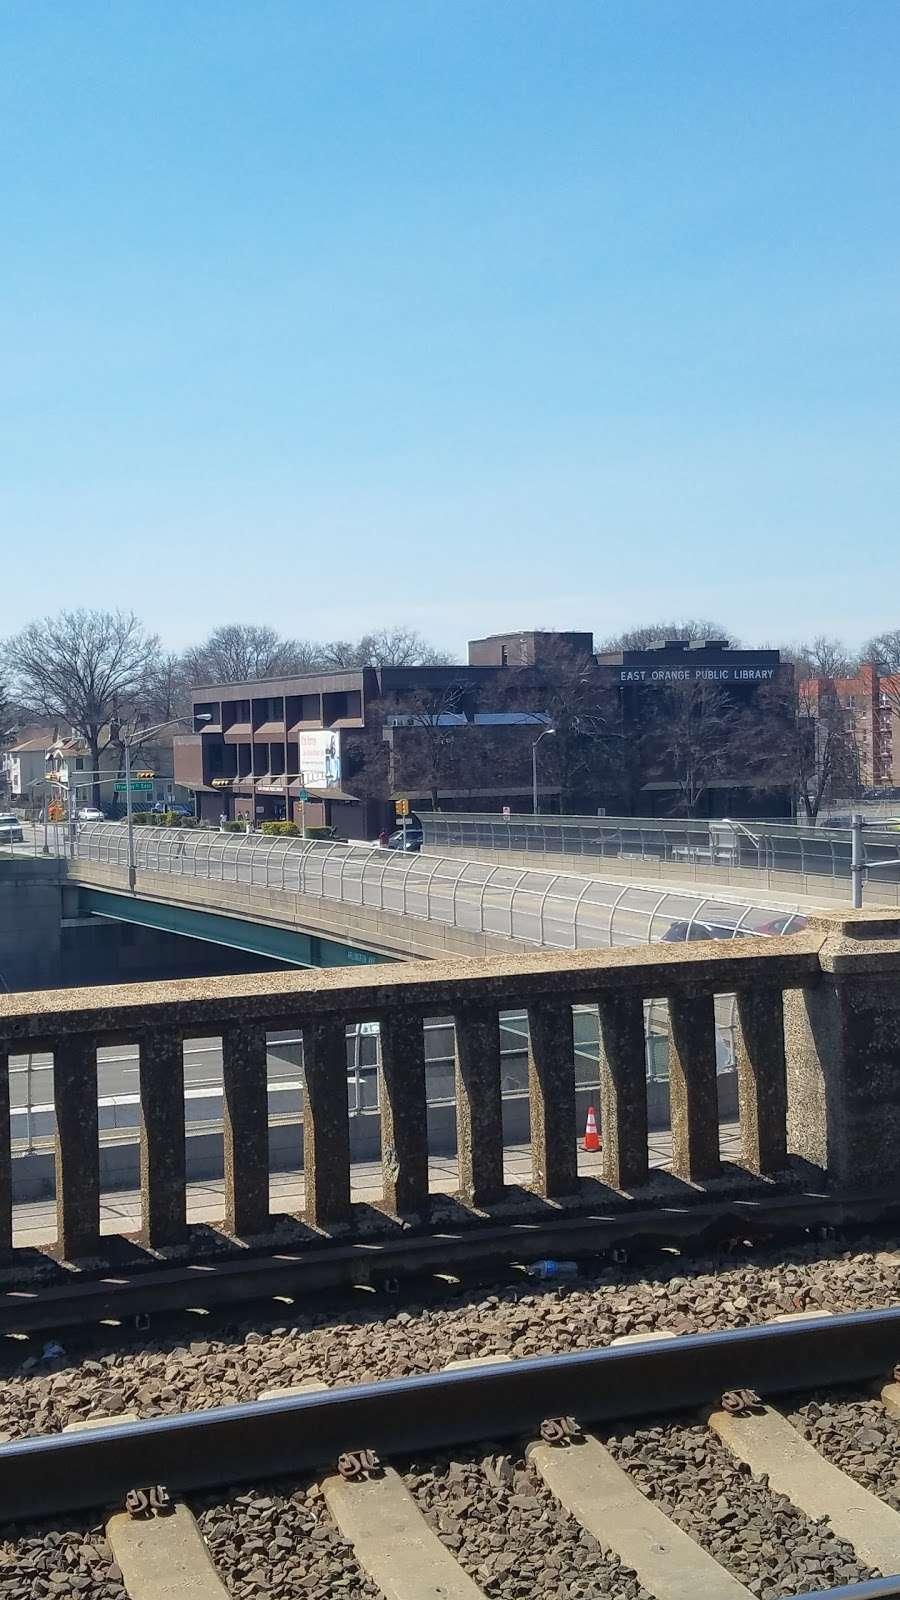 East Orange Public Library - library  | Photo 5 of 5 | Address: 21 S Arlington Ave, East Orange, NJ 07018, USA | Phone: (973) 266-5600